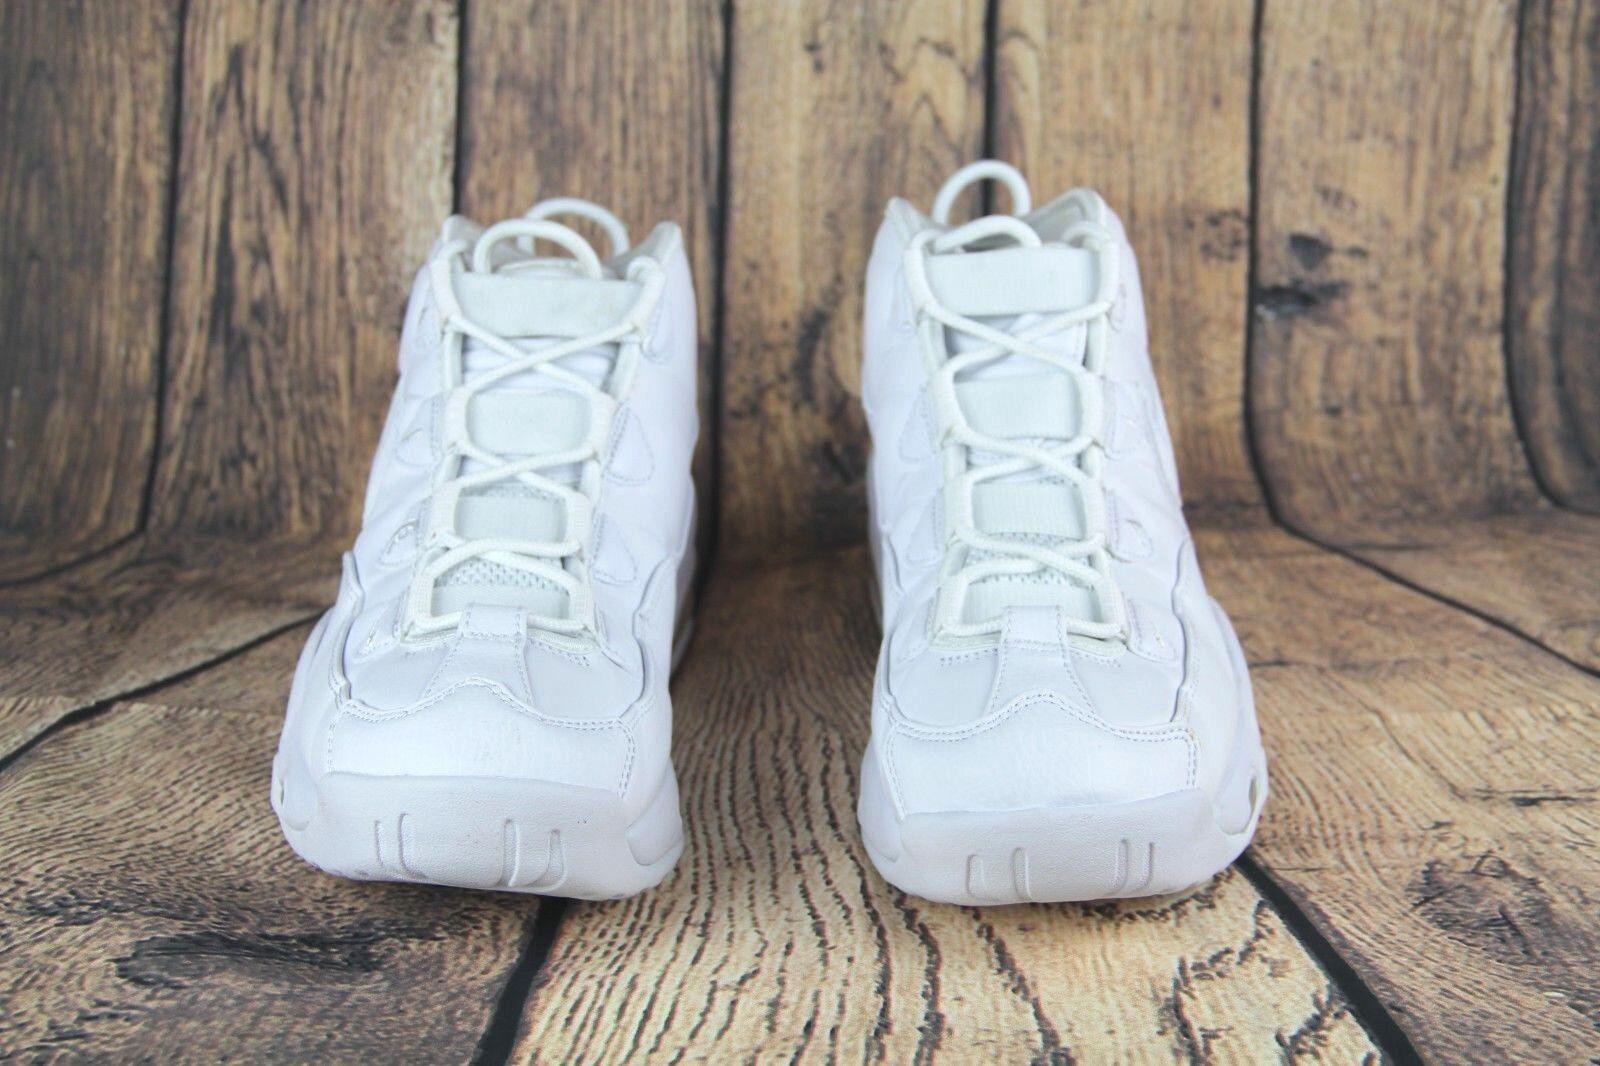 Buy Nike Air Max Uptempo 95 Triple White Classic Men Basketball ... 563a9fb05